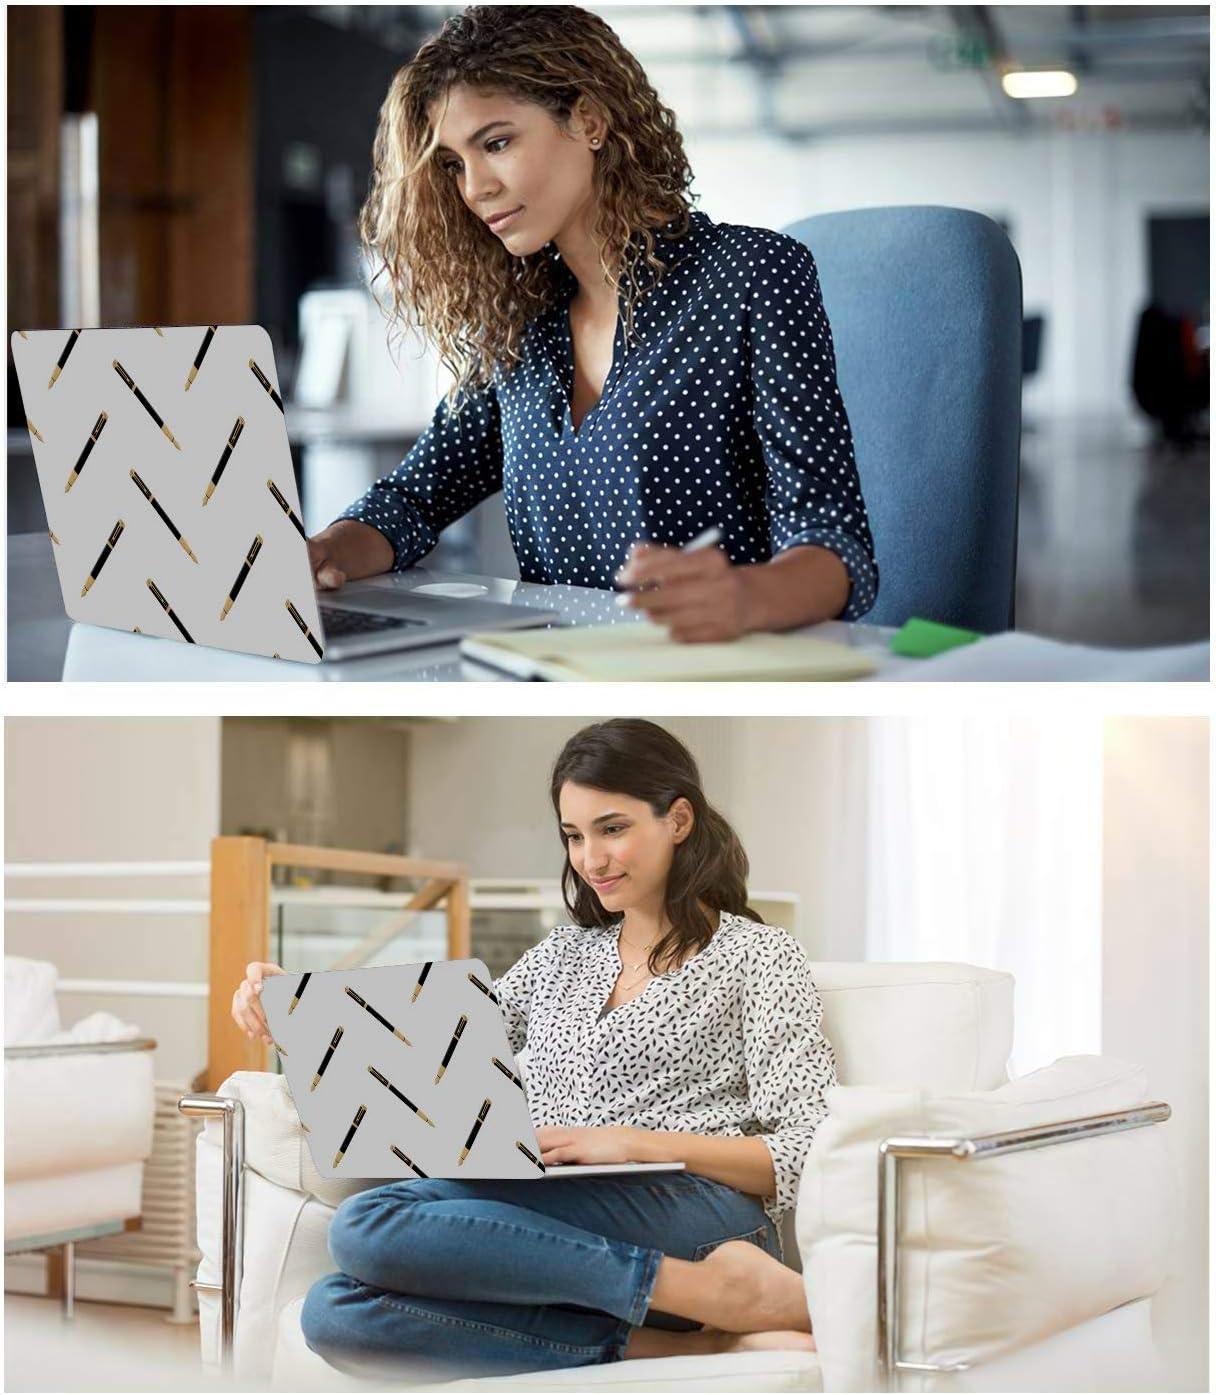 Laptop Case MacBook Pro School Creative Art Fashion Pen Writing Plastic Hard Shell Compatible Mac Air 11 Pro 13 15 2018 MacBook Pro Accessories Protection for MacBook 2016-2019 Version